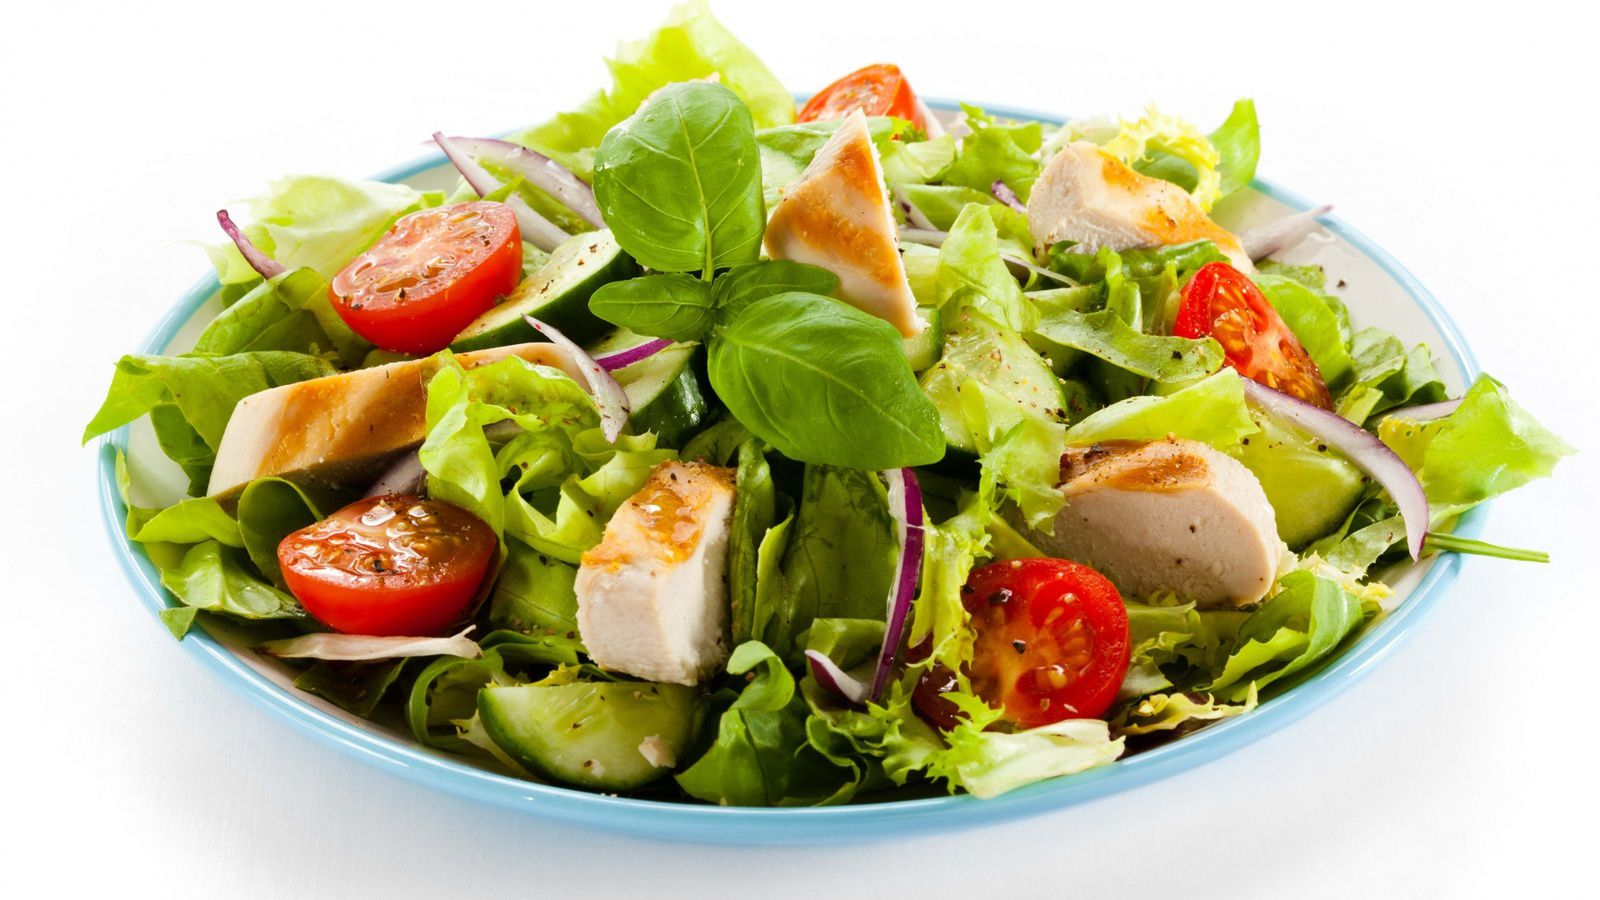 Bon appétit - Salade - Nourriture - Wallpaper - Free